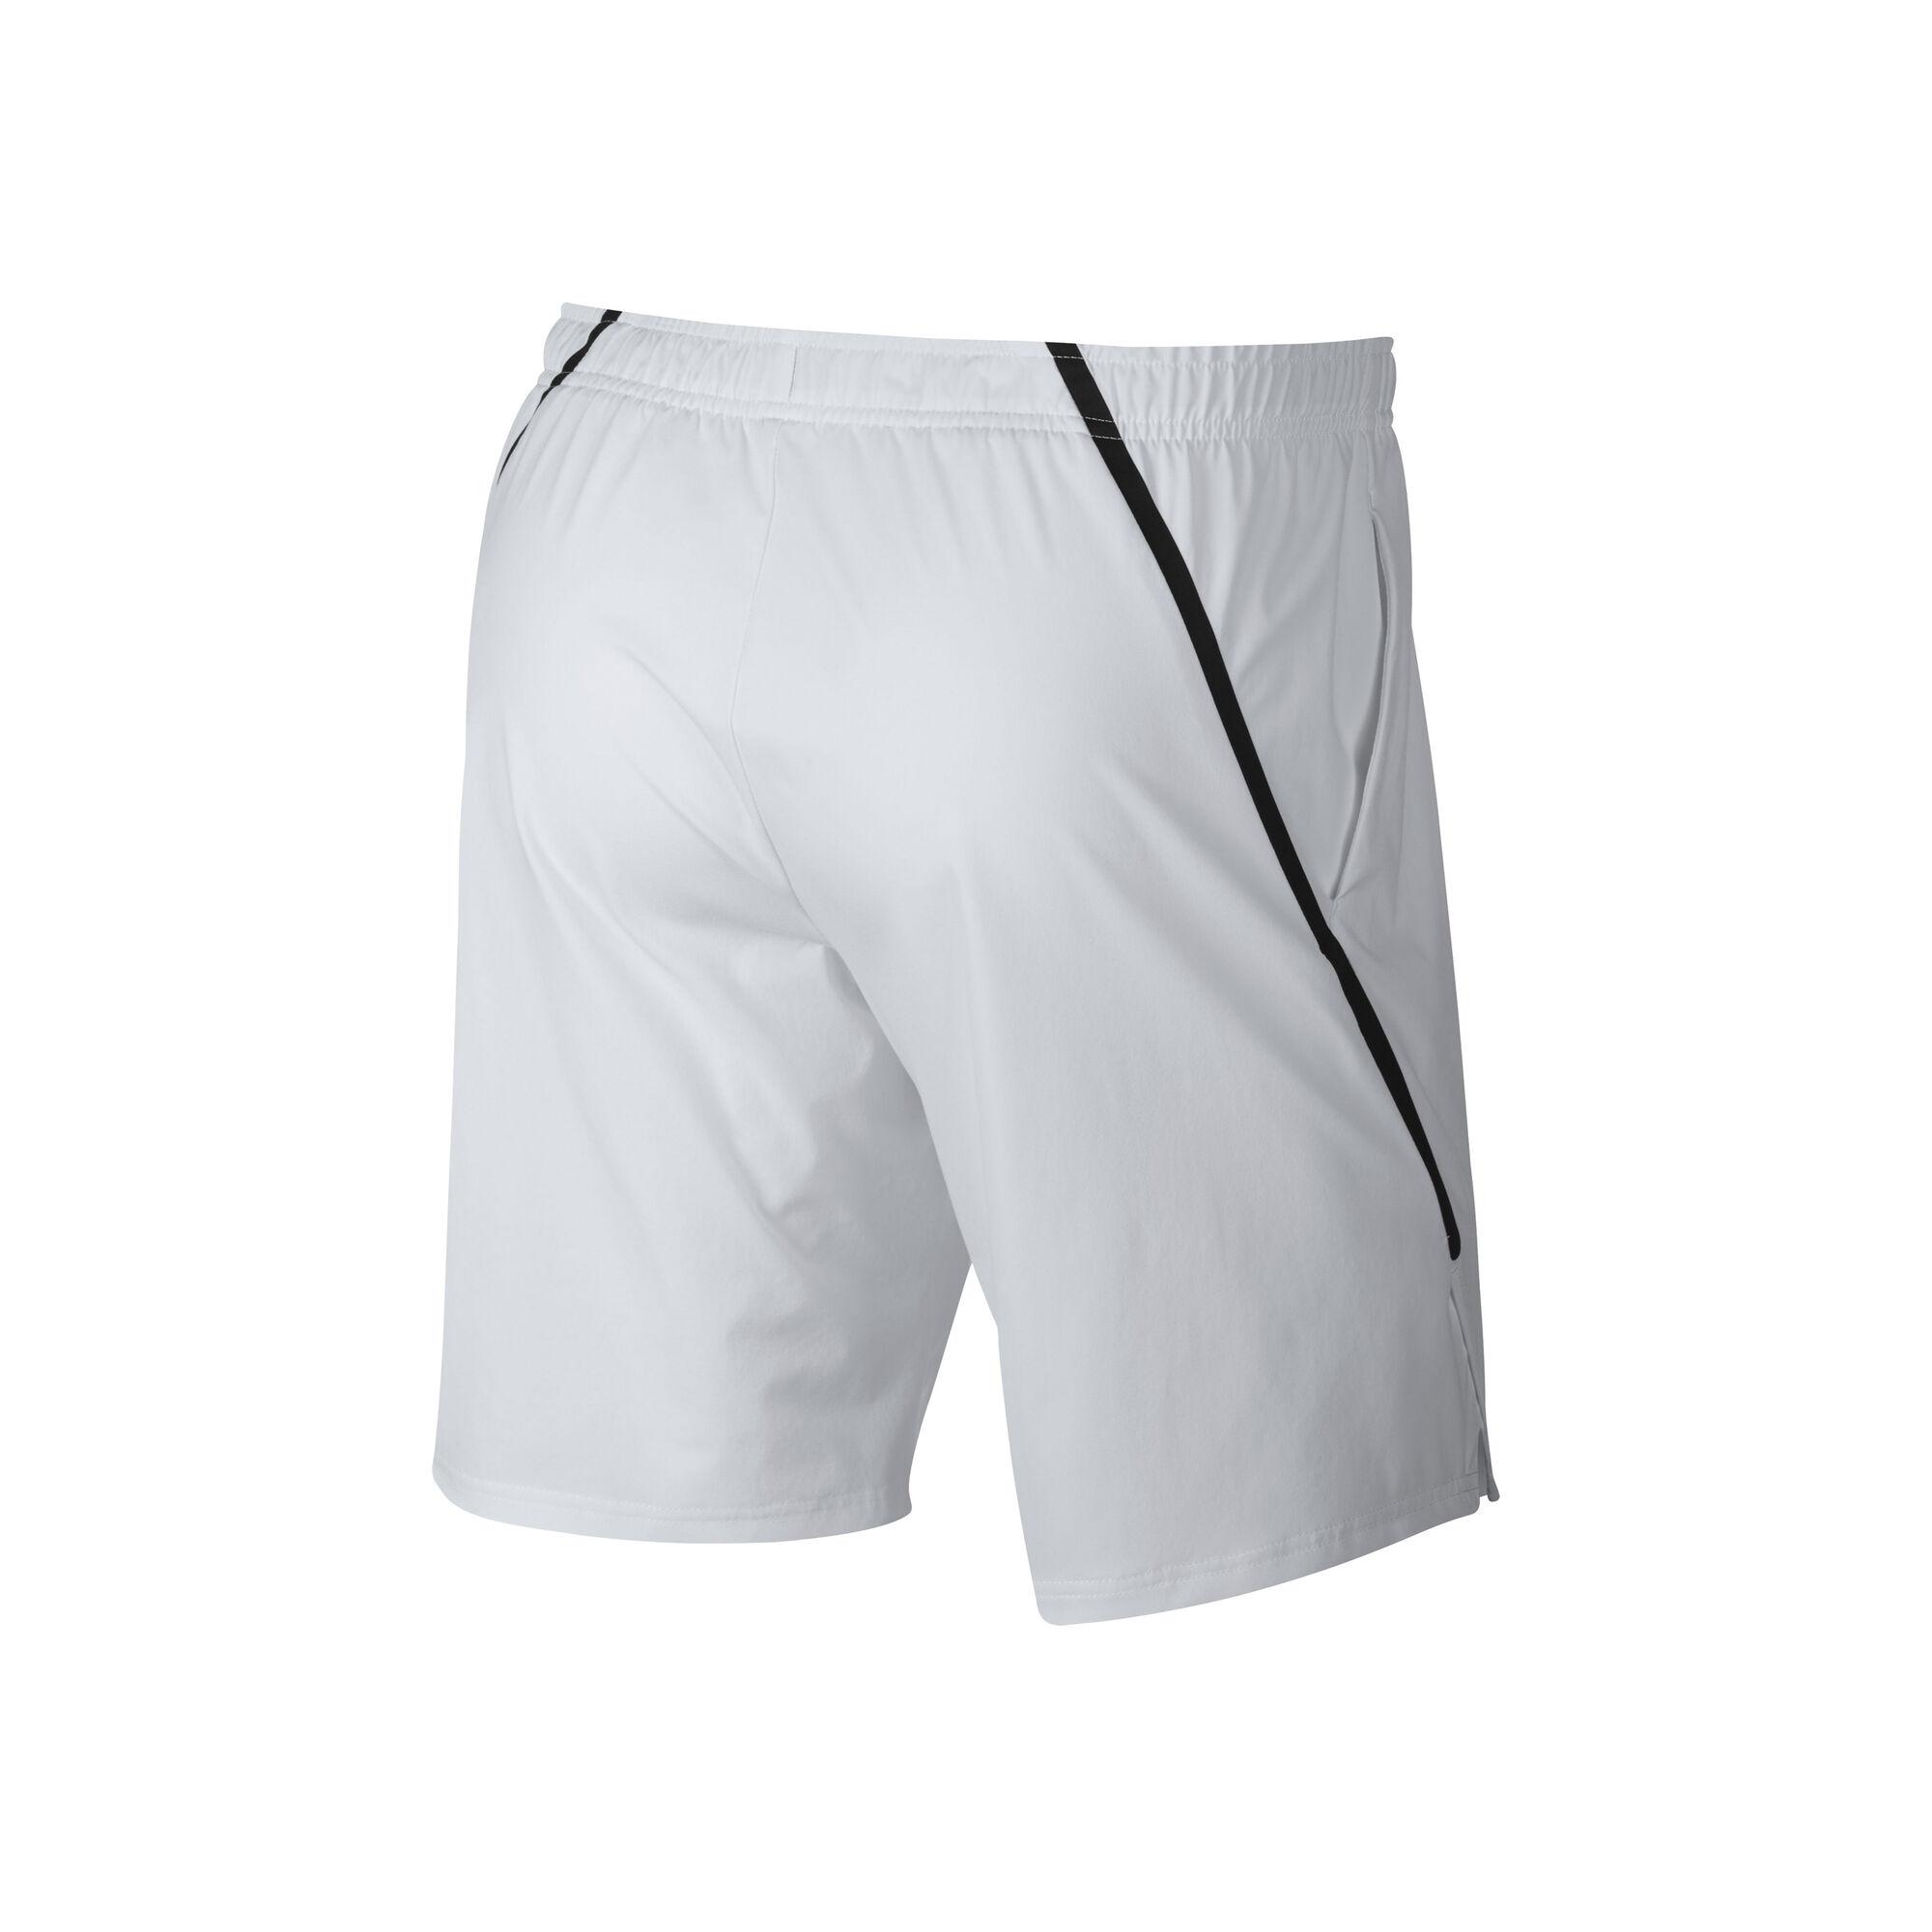 9cfcaf749c9 Nike; Nike; Nike; Nike; Nike; Nike; Nike; Nike; Nike; Nike. Court Flex Ace Tennis  Shorts ...